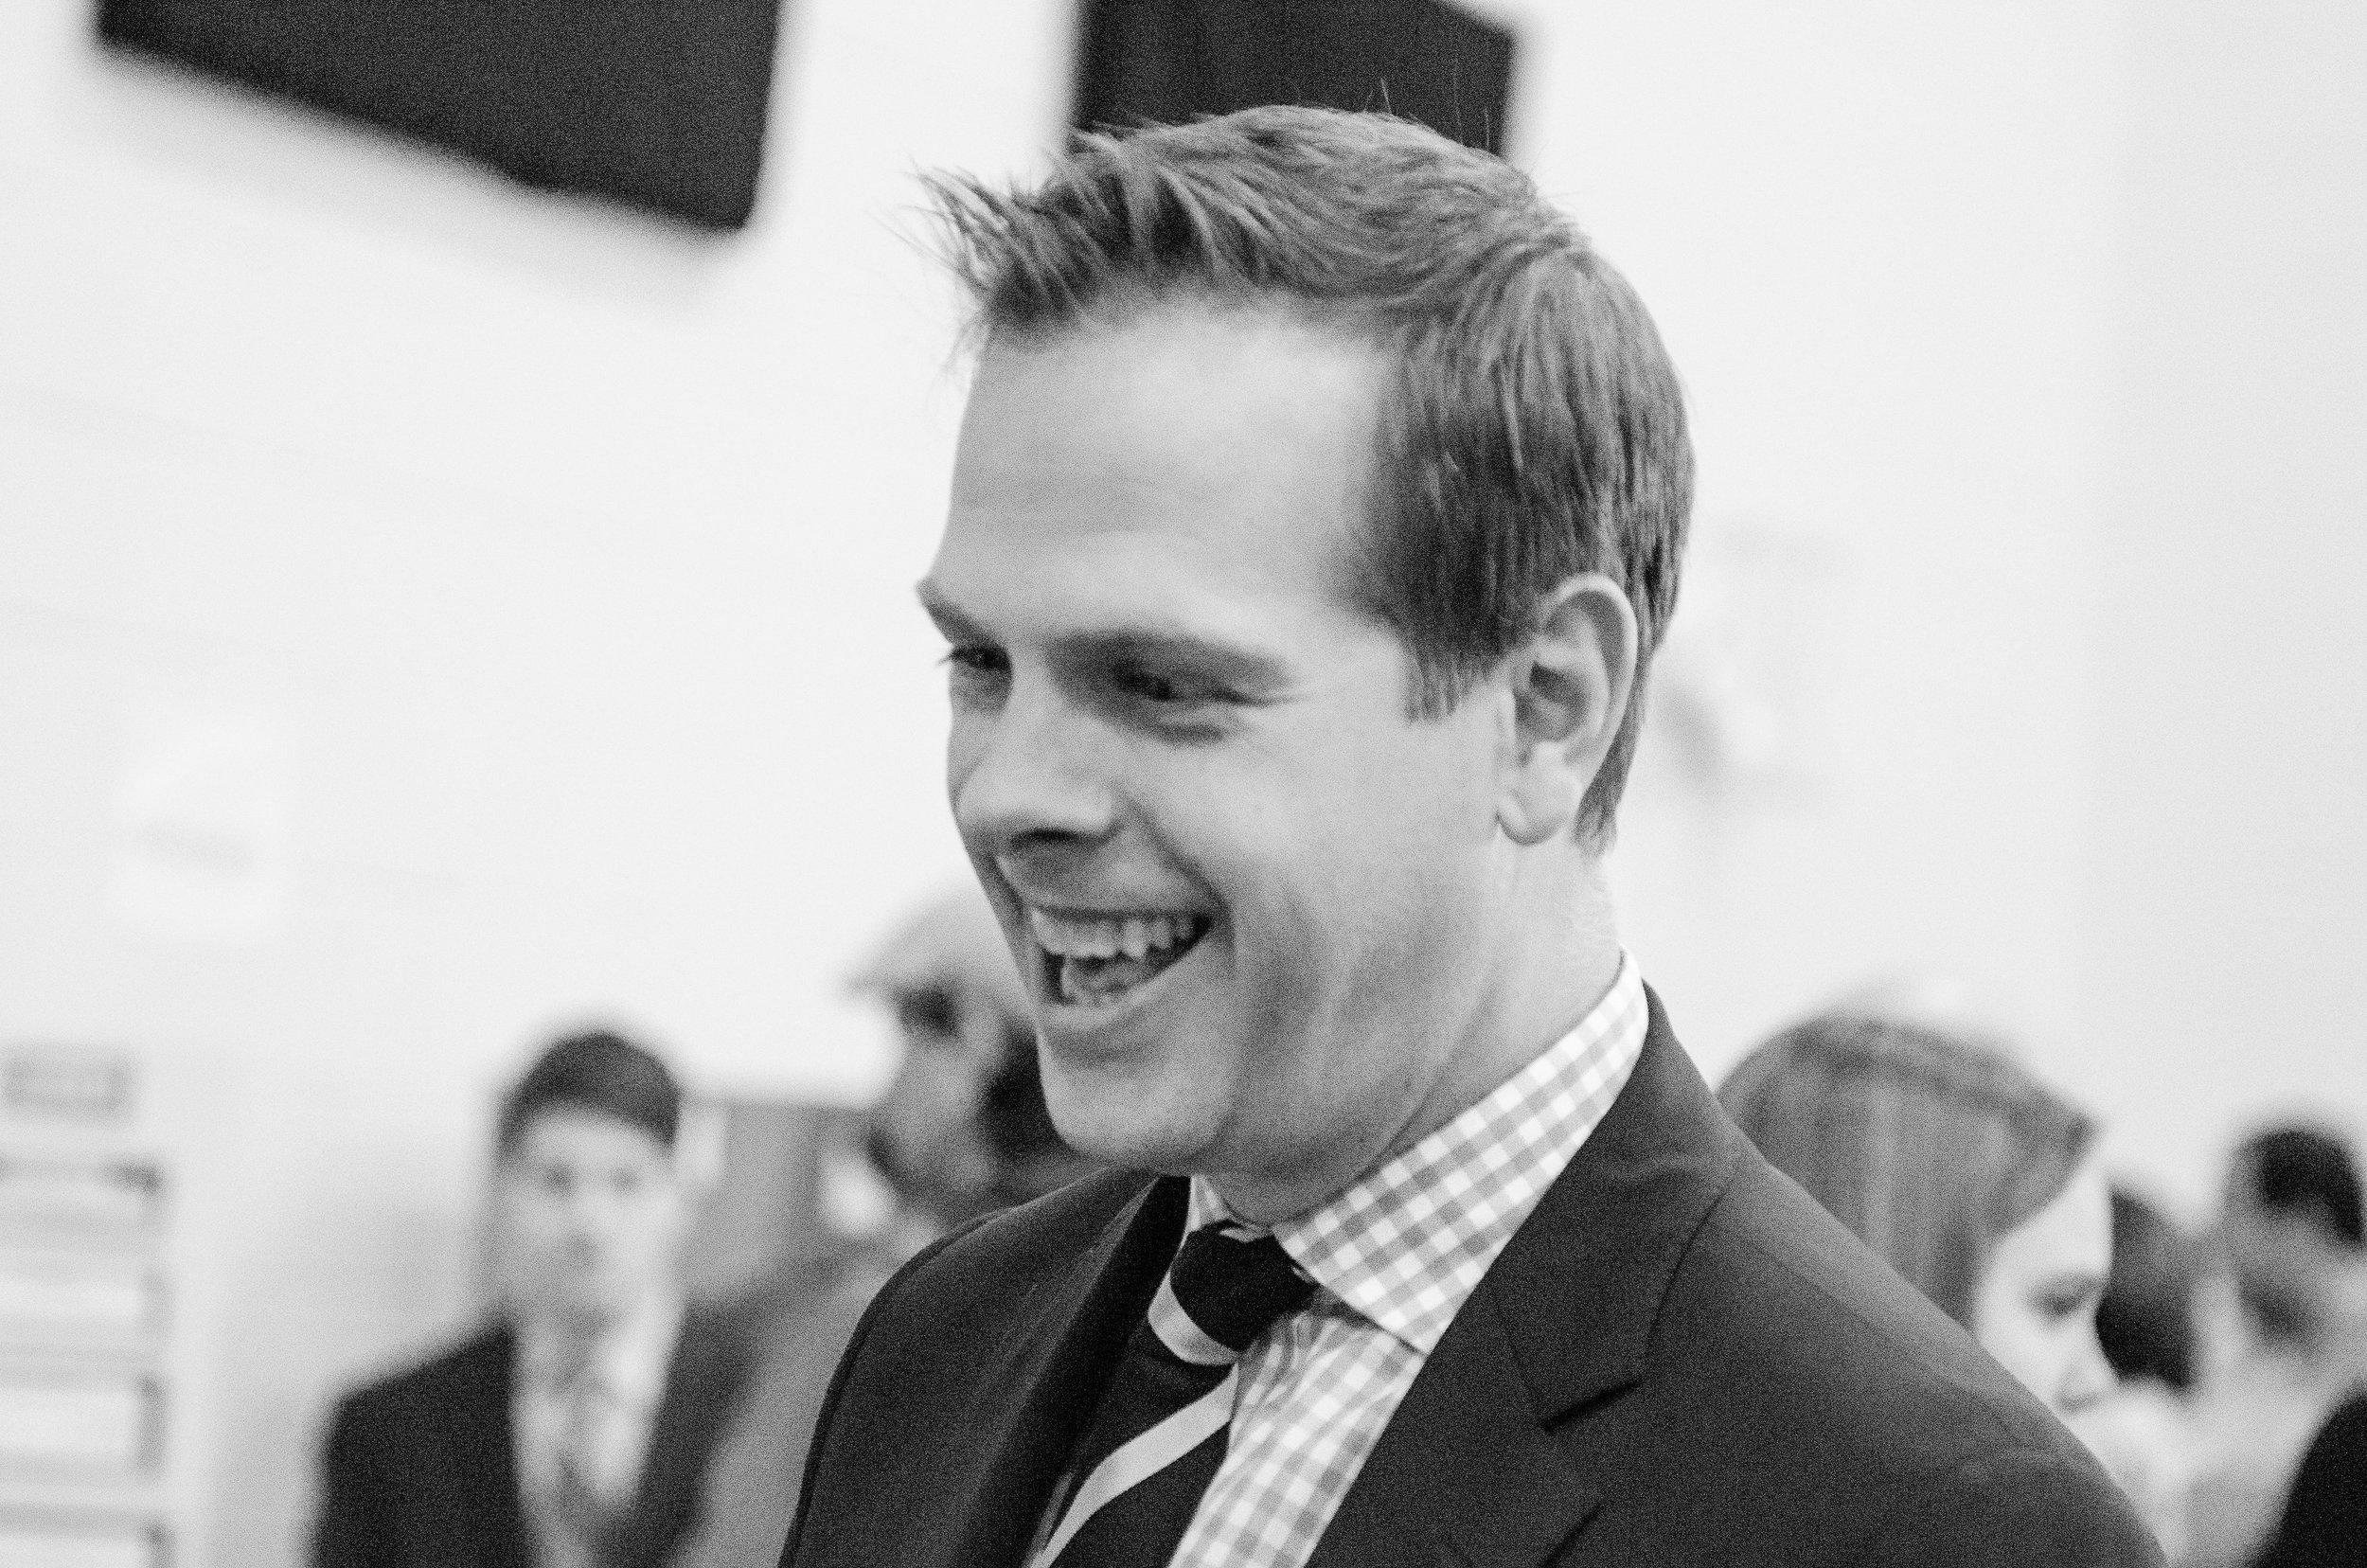 Head of School Greg Bamford